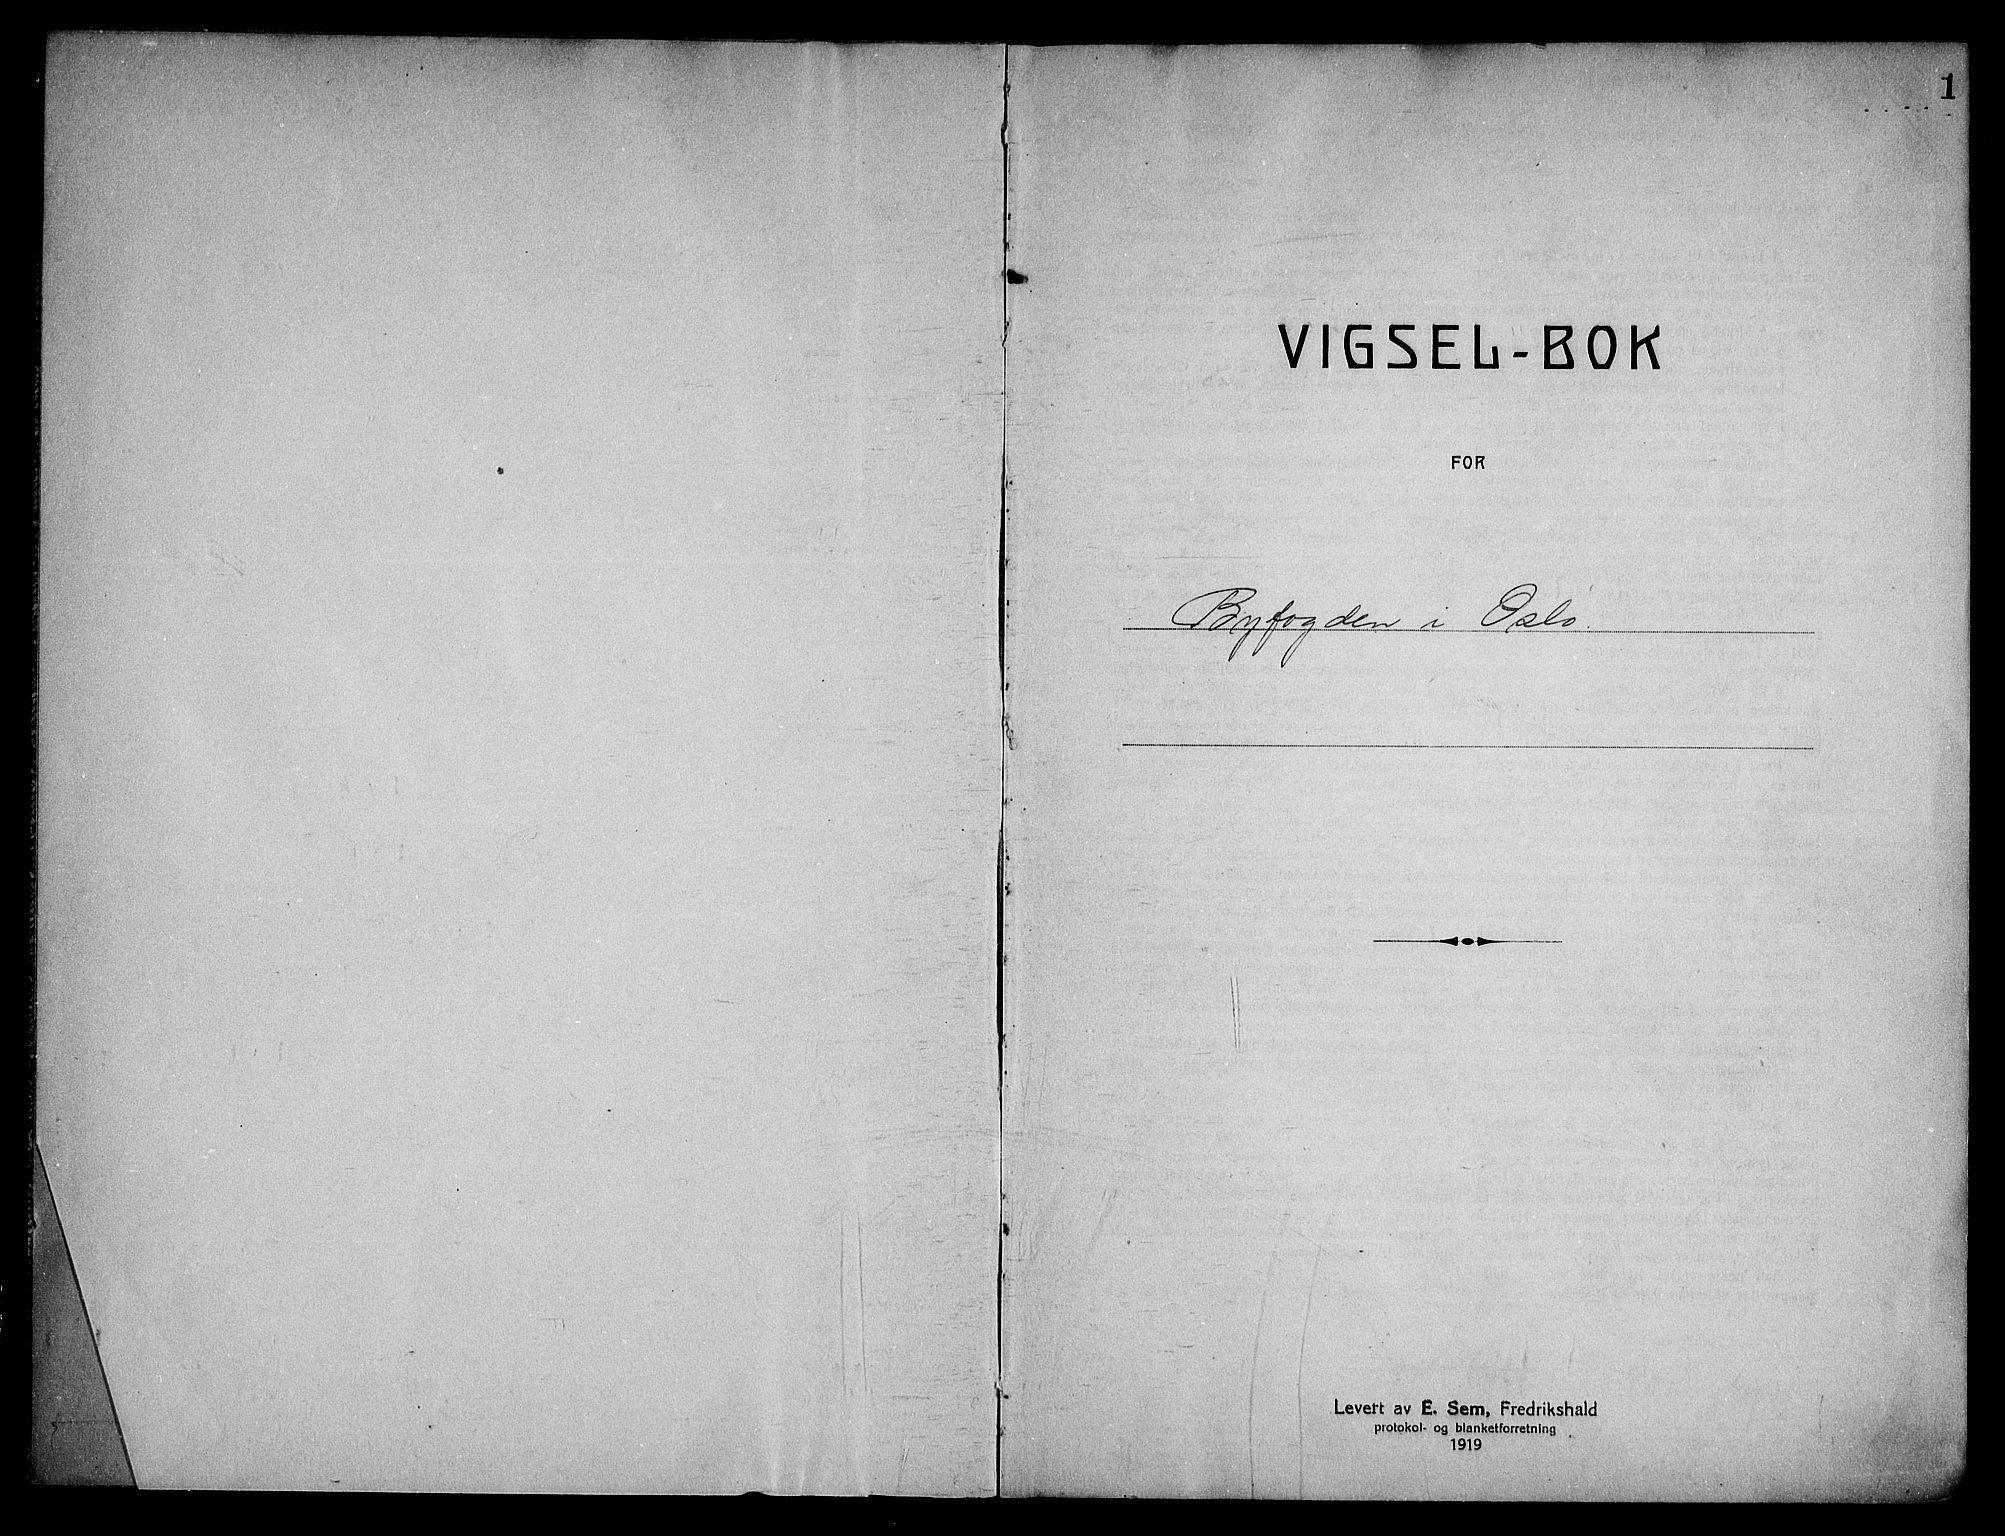 SAO, Oslo byfogd avd. I, L/Lb/Lbb/L0021: Notarialprotokoll, rekke II: Vigsler, 1930-1932, s. 1a